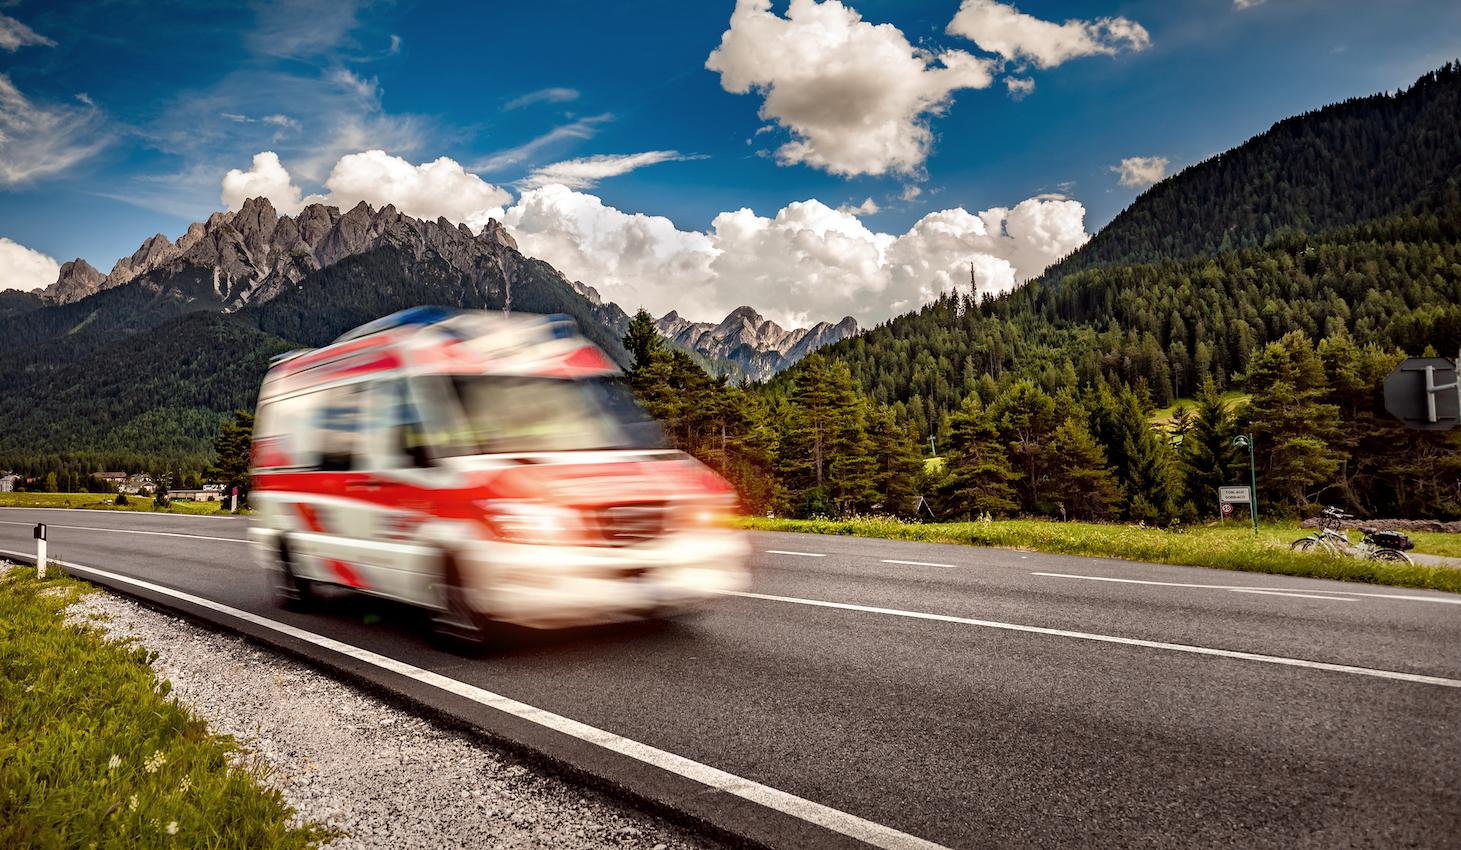 ERC donates ambulances to support Ethiopia